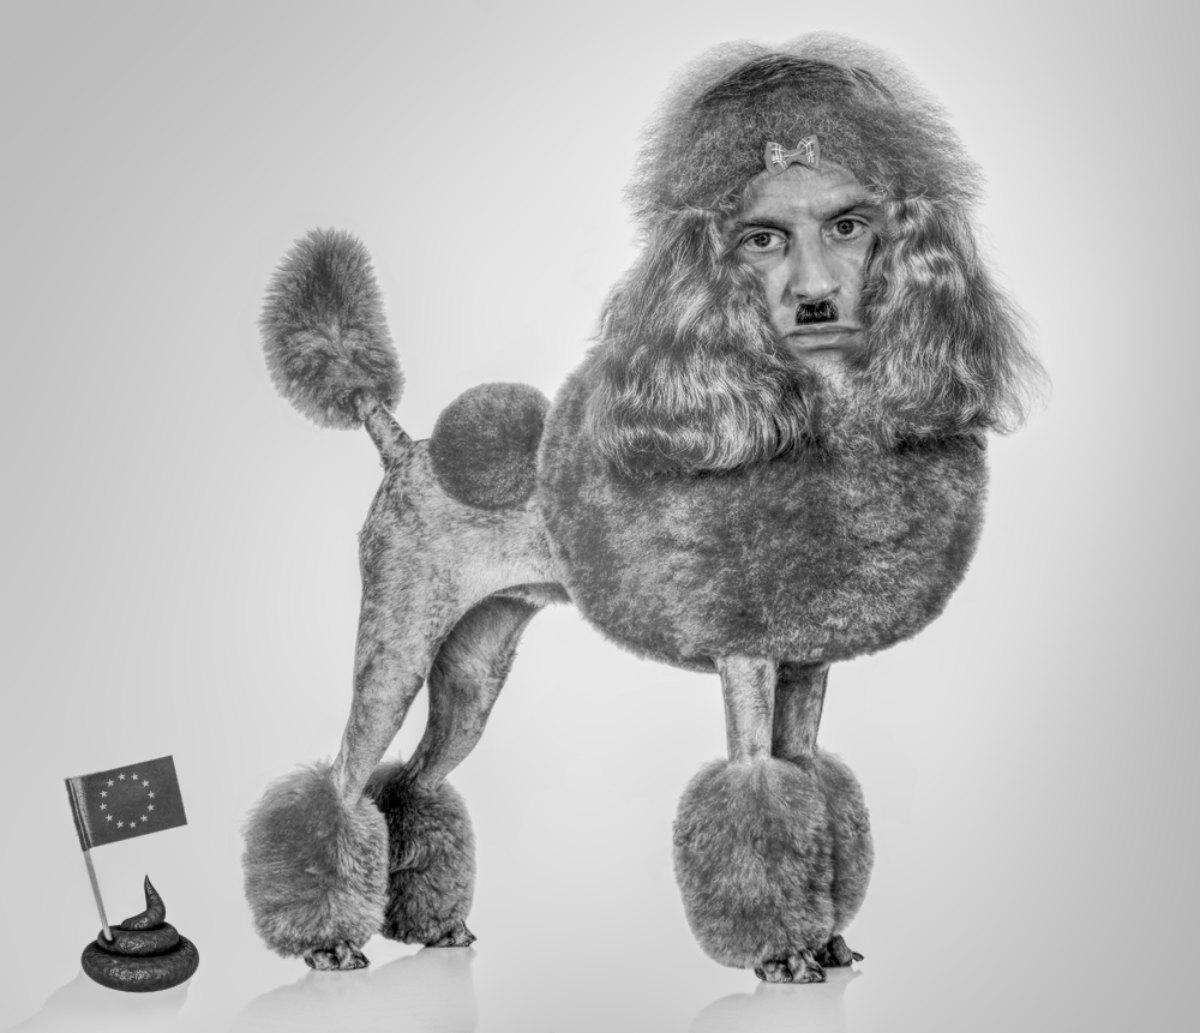 macron toy poodle